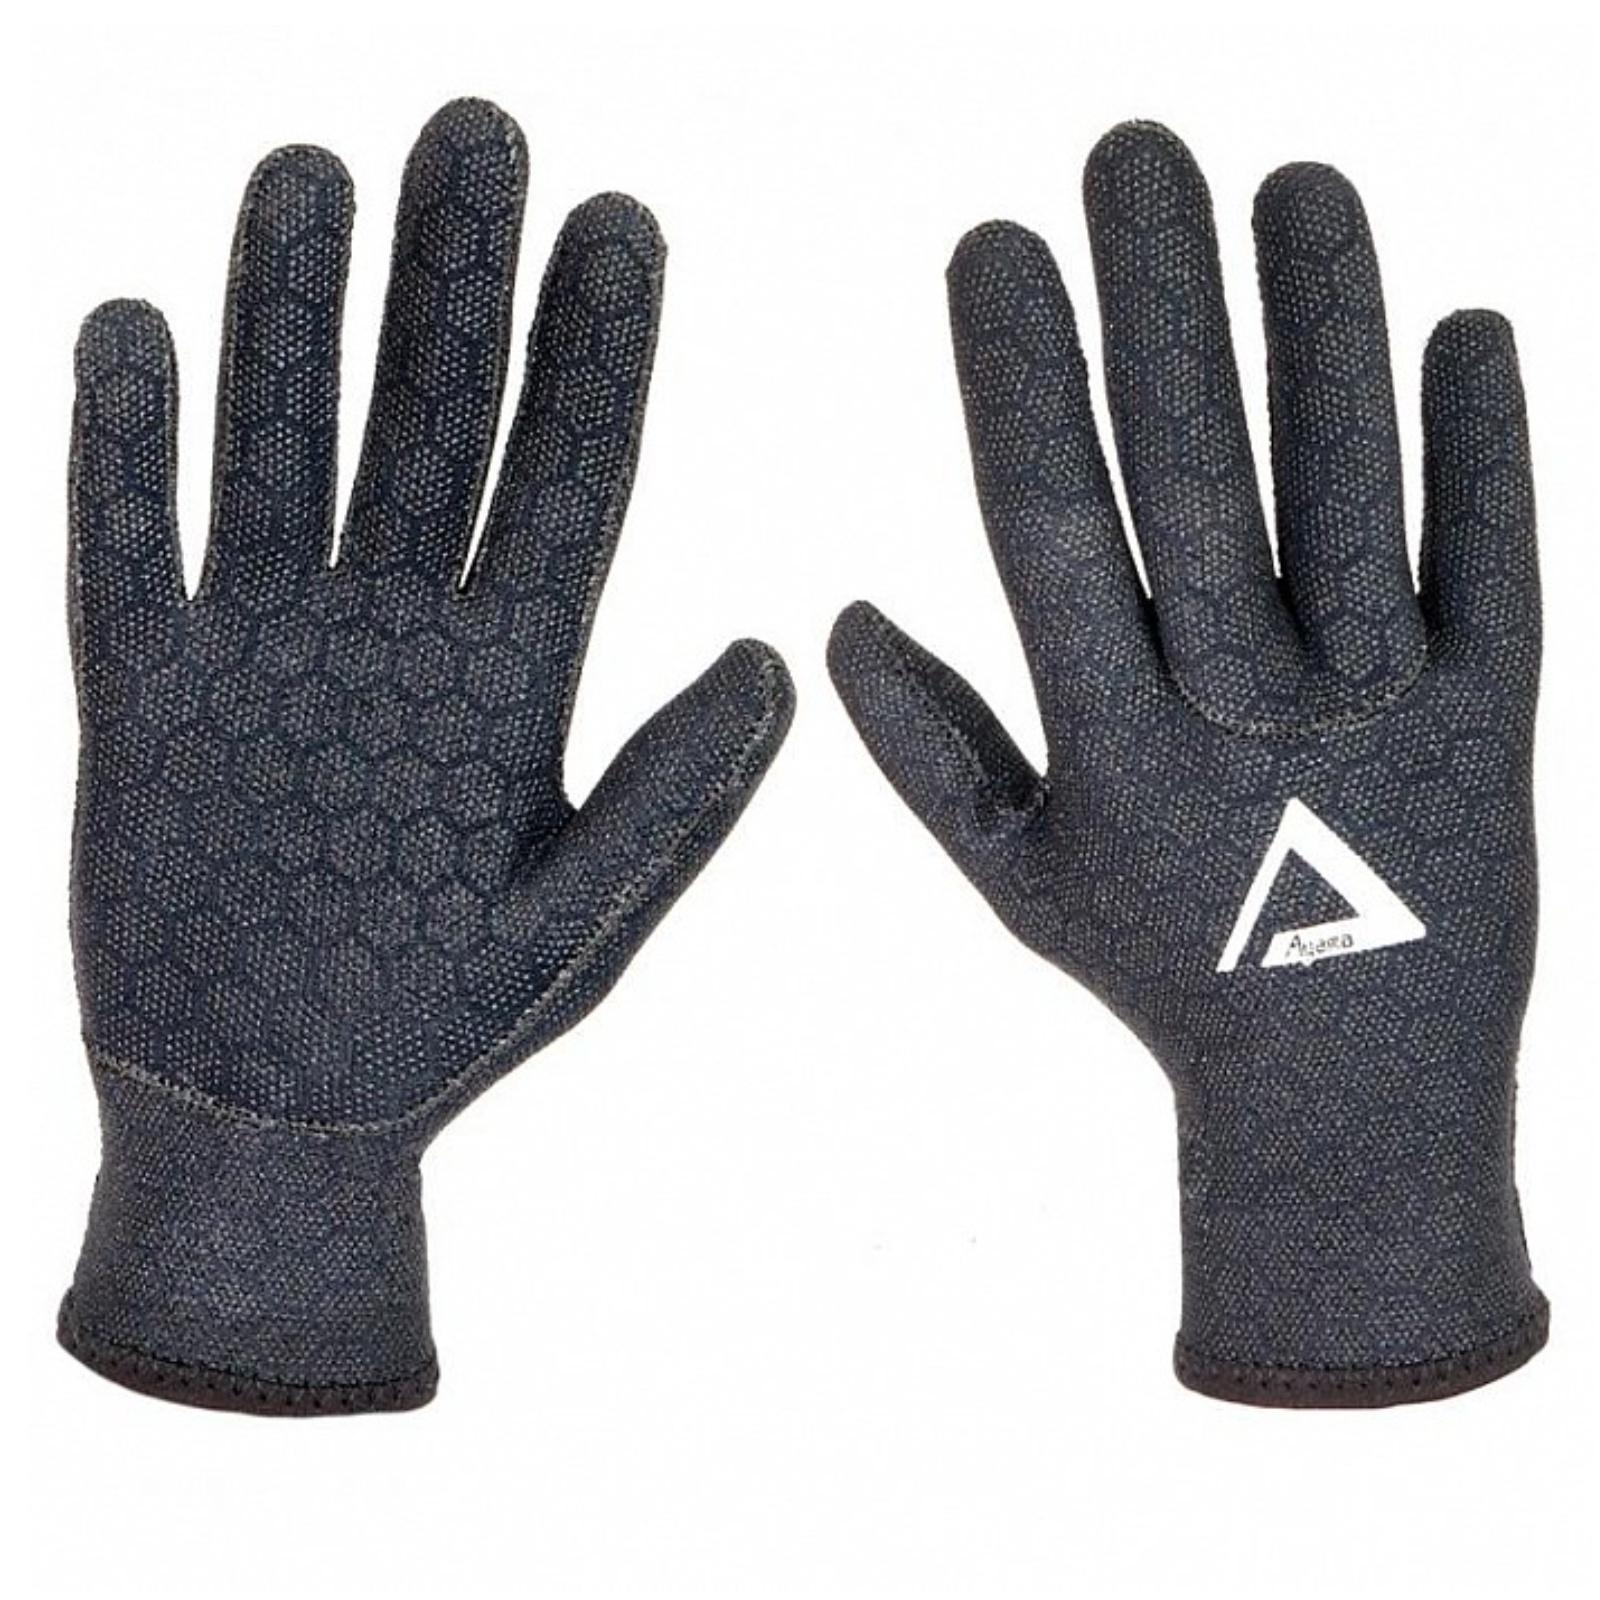 Neoprenové rukavice AGAMA Superstretch 1,5 mm - vel. M